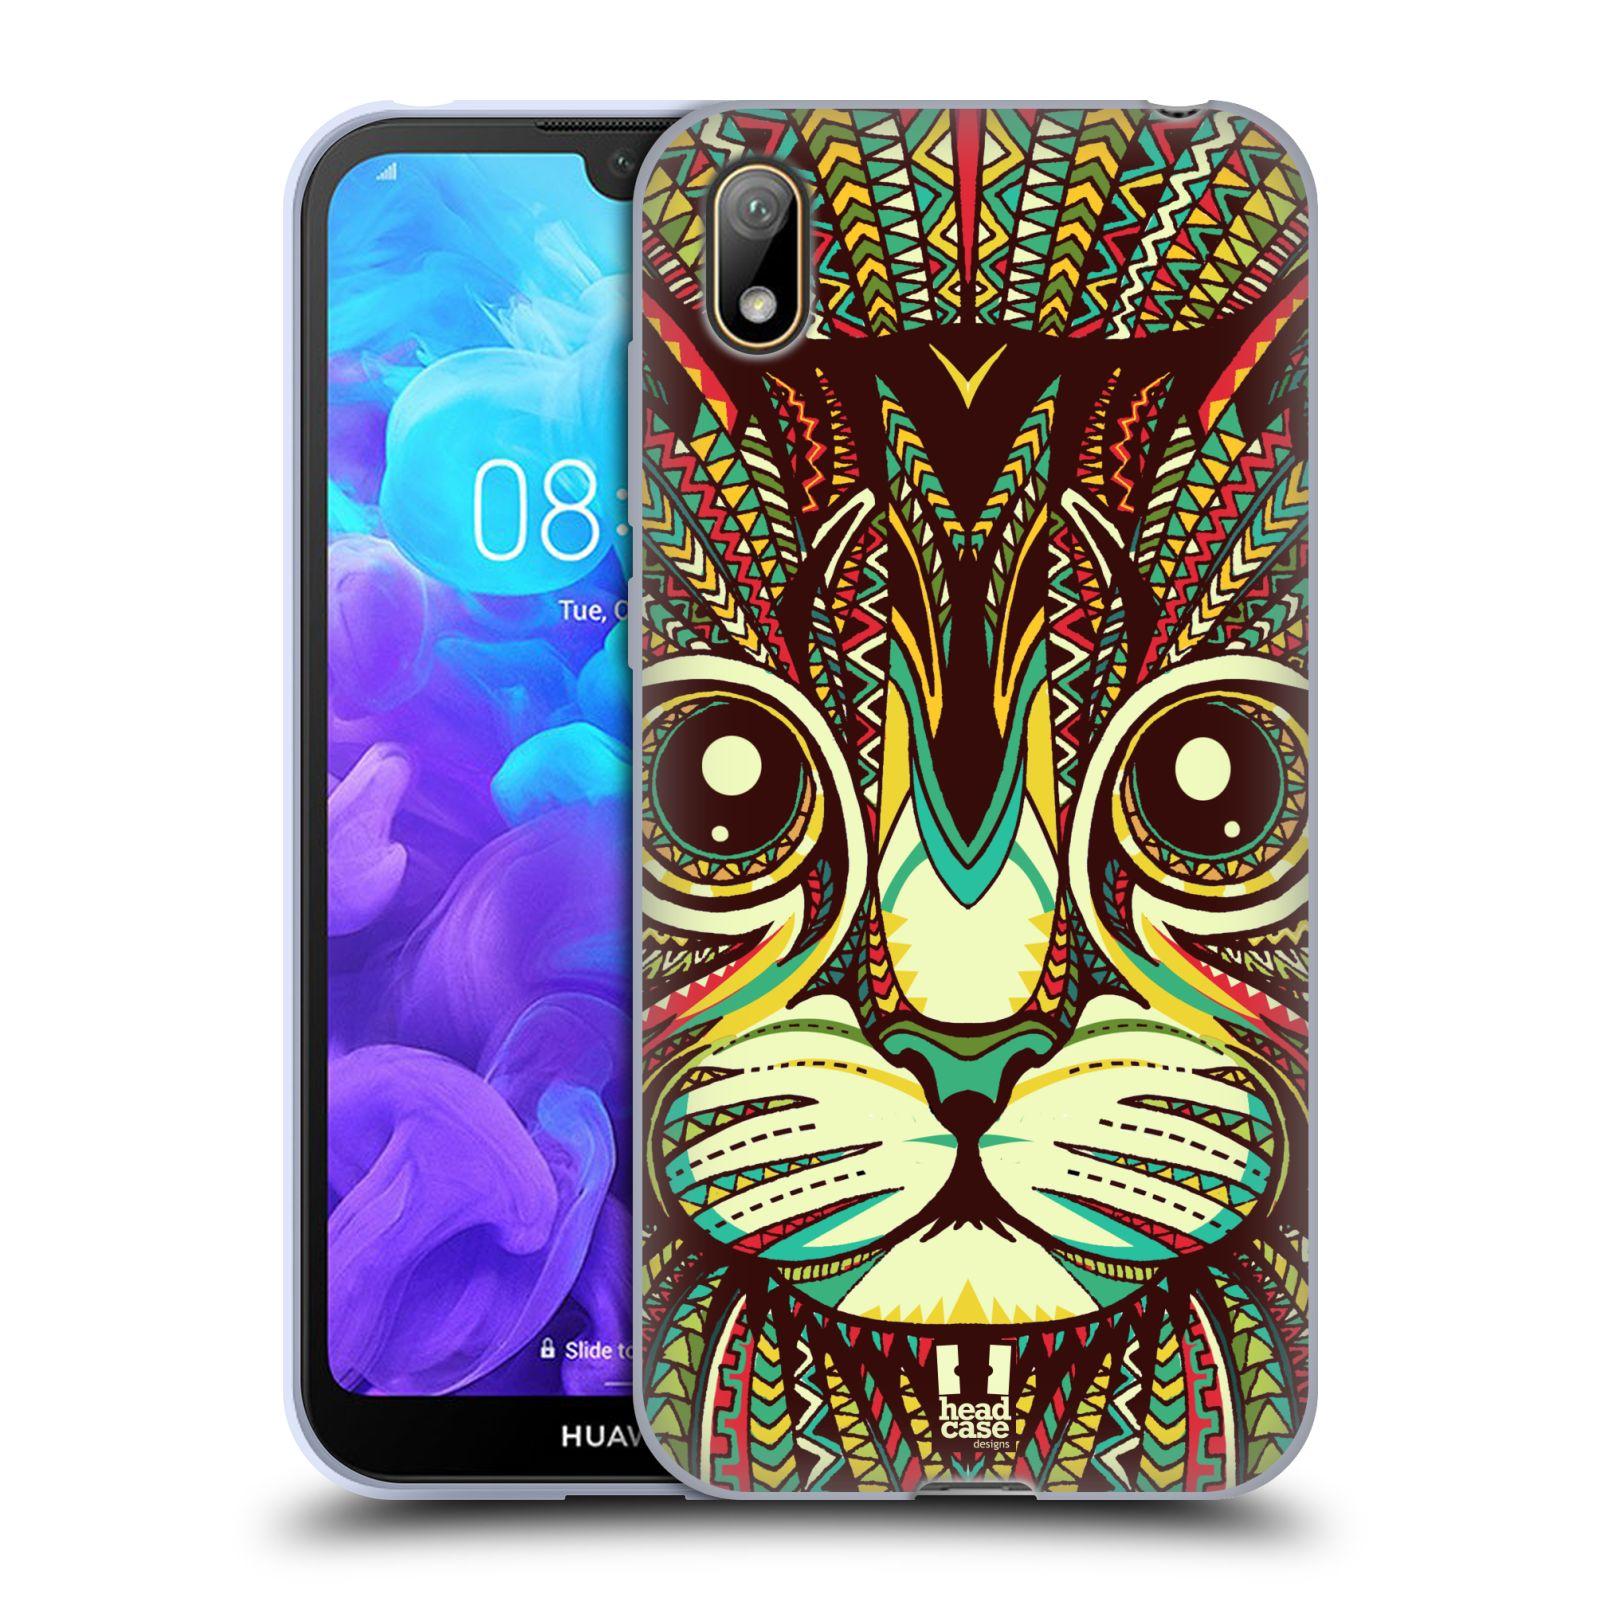 Silikonové pouzdro na mobil Huawei Y5 (2019) - Head Case - AZTEC KOČKA